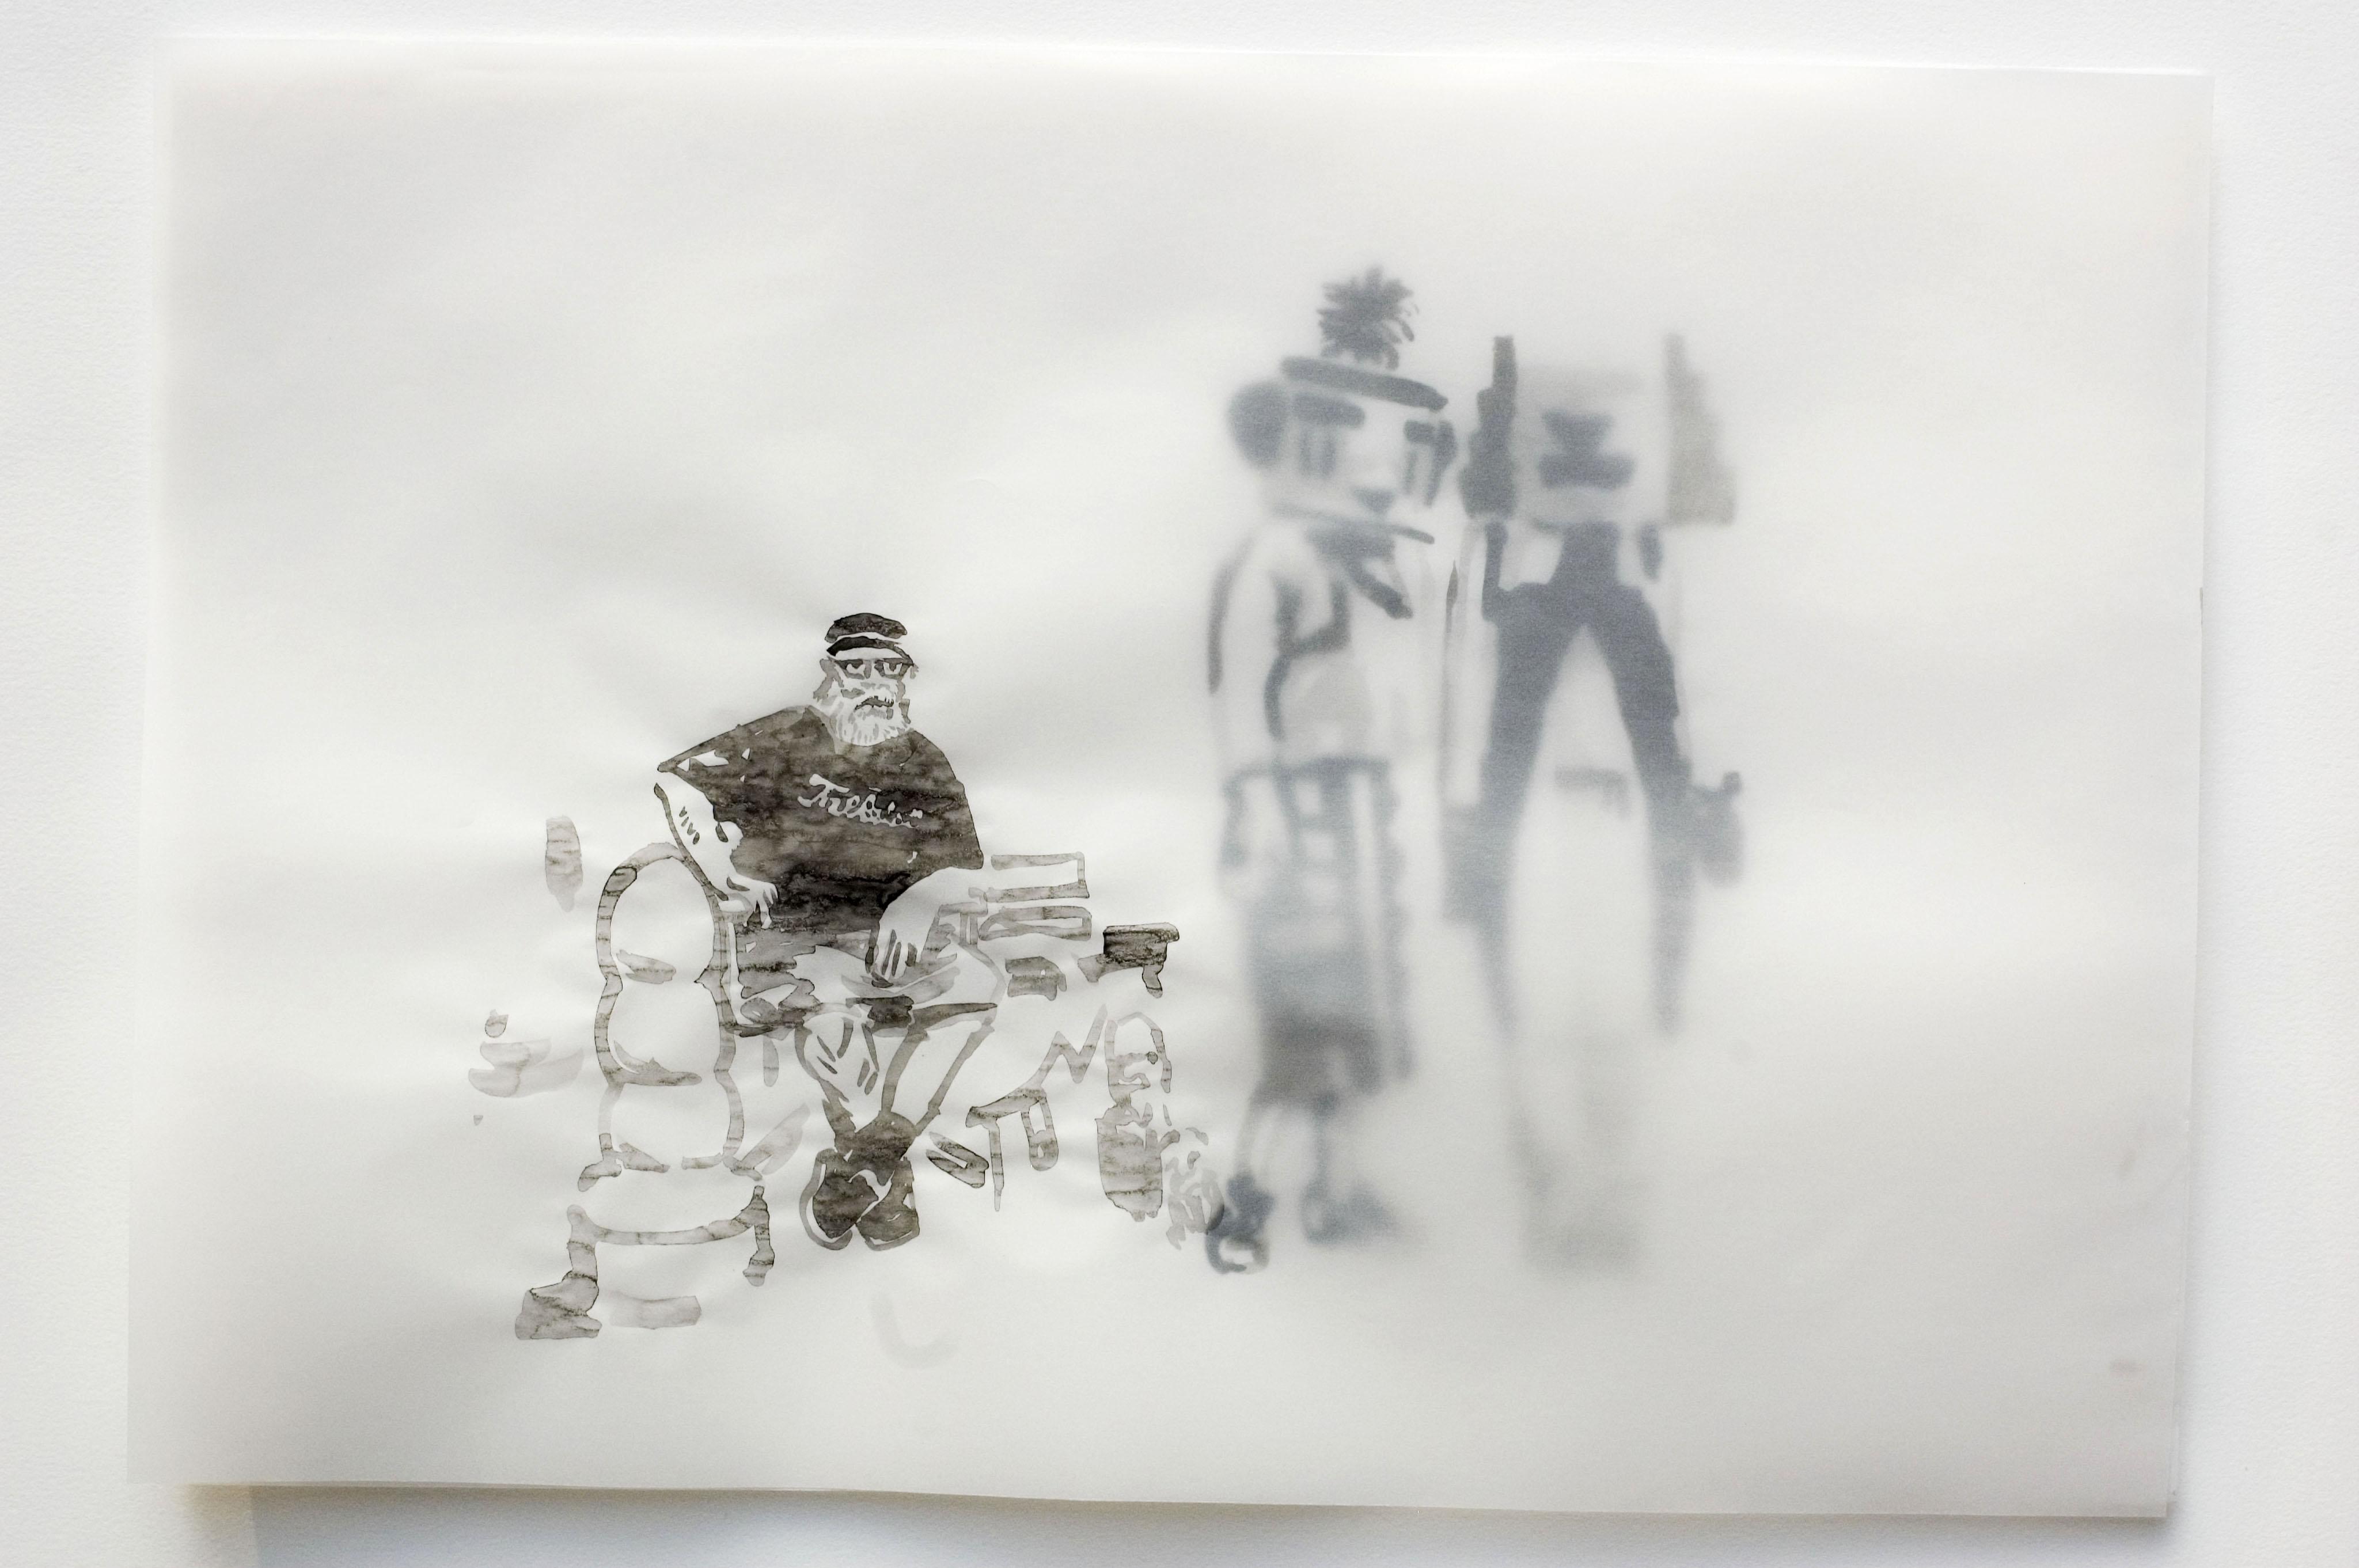 Cony Theis, Küntslerkosmos, 2005 - 2007, Raimond (Pettibon, Sophie Taeuber-Arp), chinesische Tusche, Öl, Transparentpapier.29,7 x 42cm